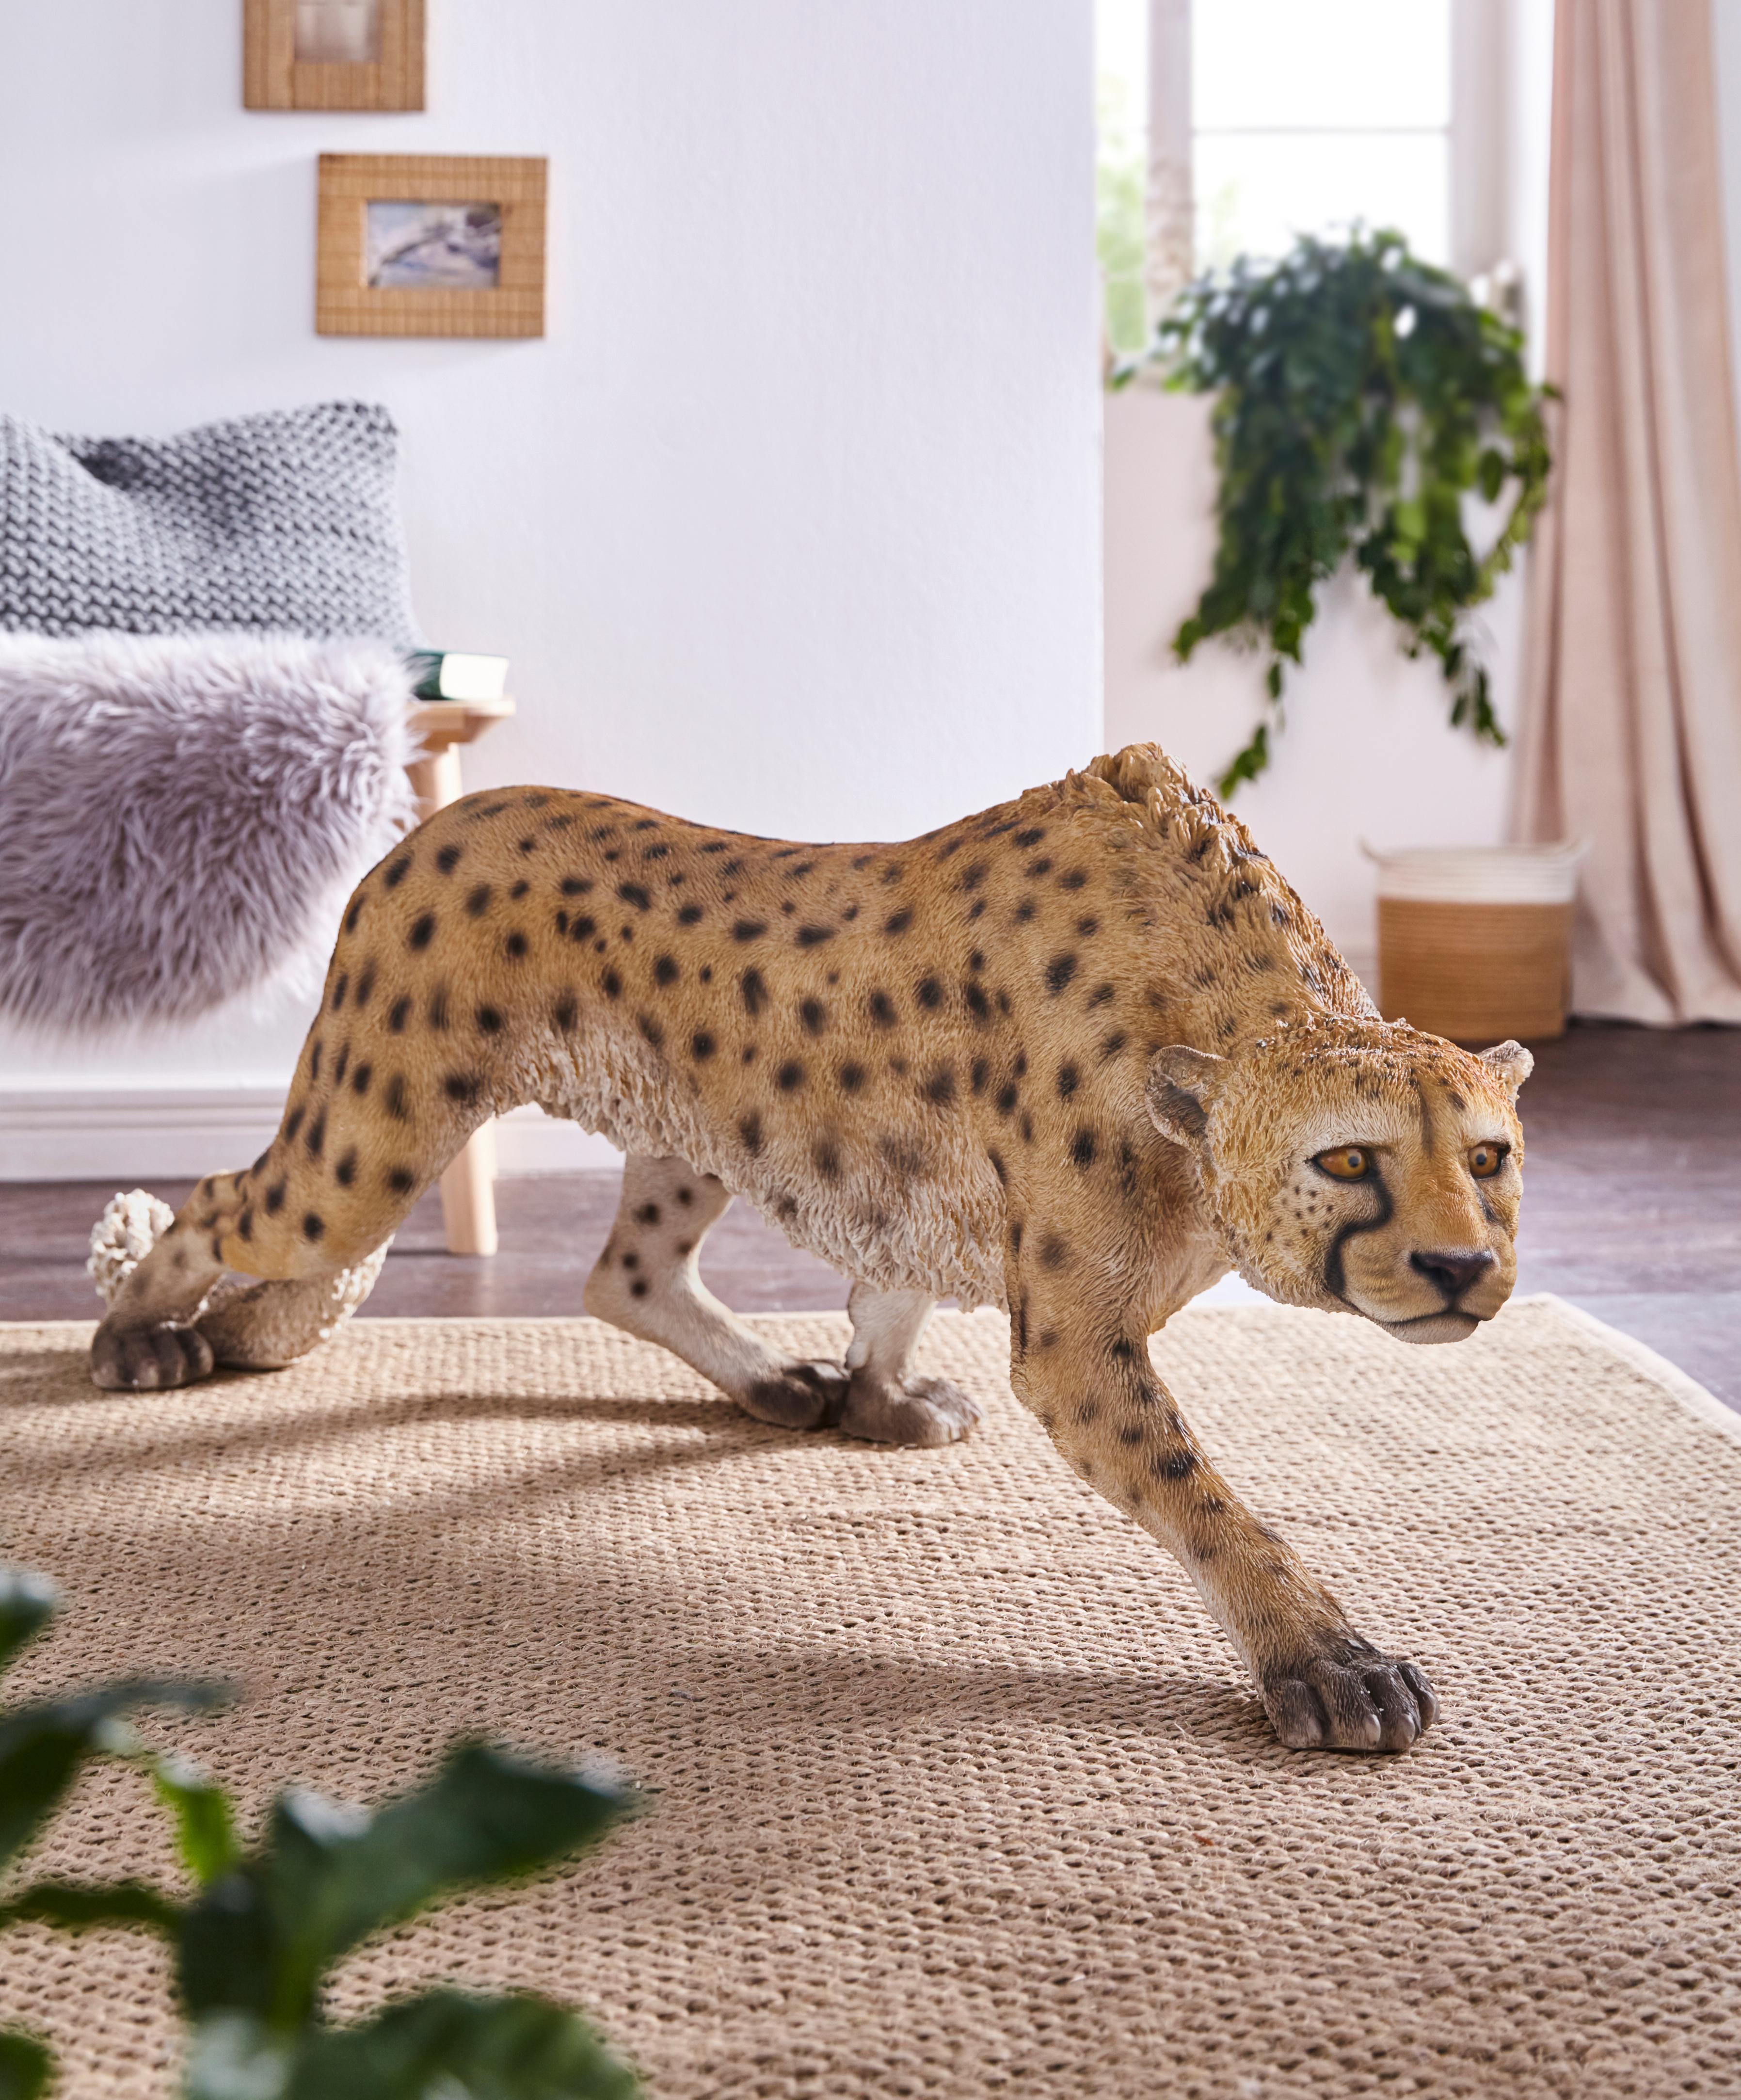 Home affaire Deko-Figur »Gepard« Breite: 128 cm   Dekoration > Figuren und Skulpturen > Figuren   home affaire